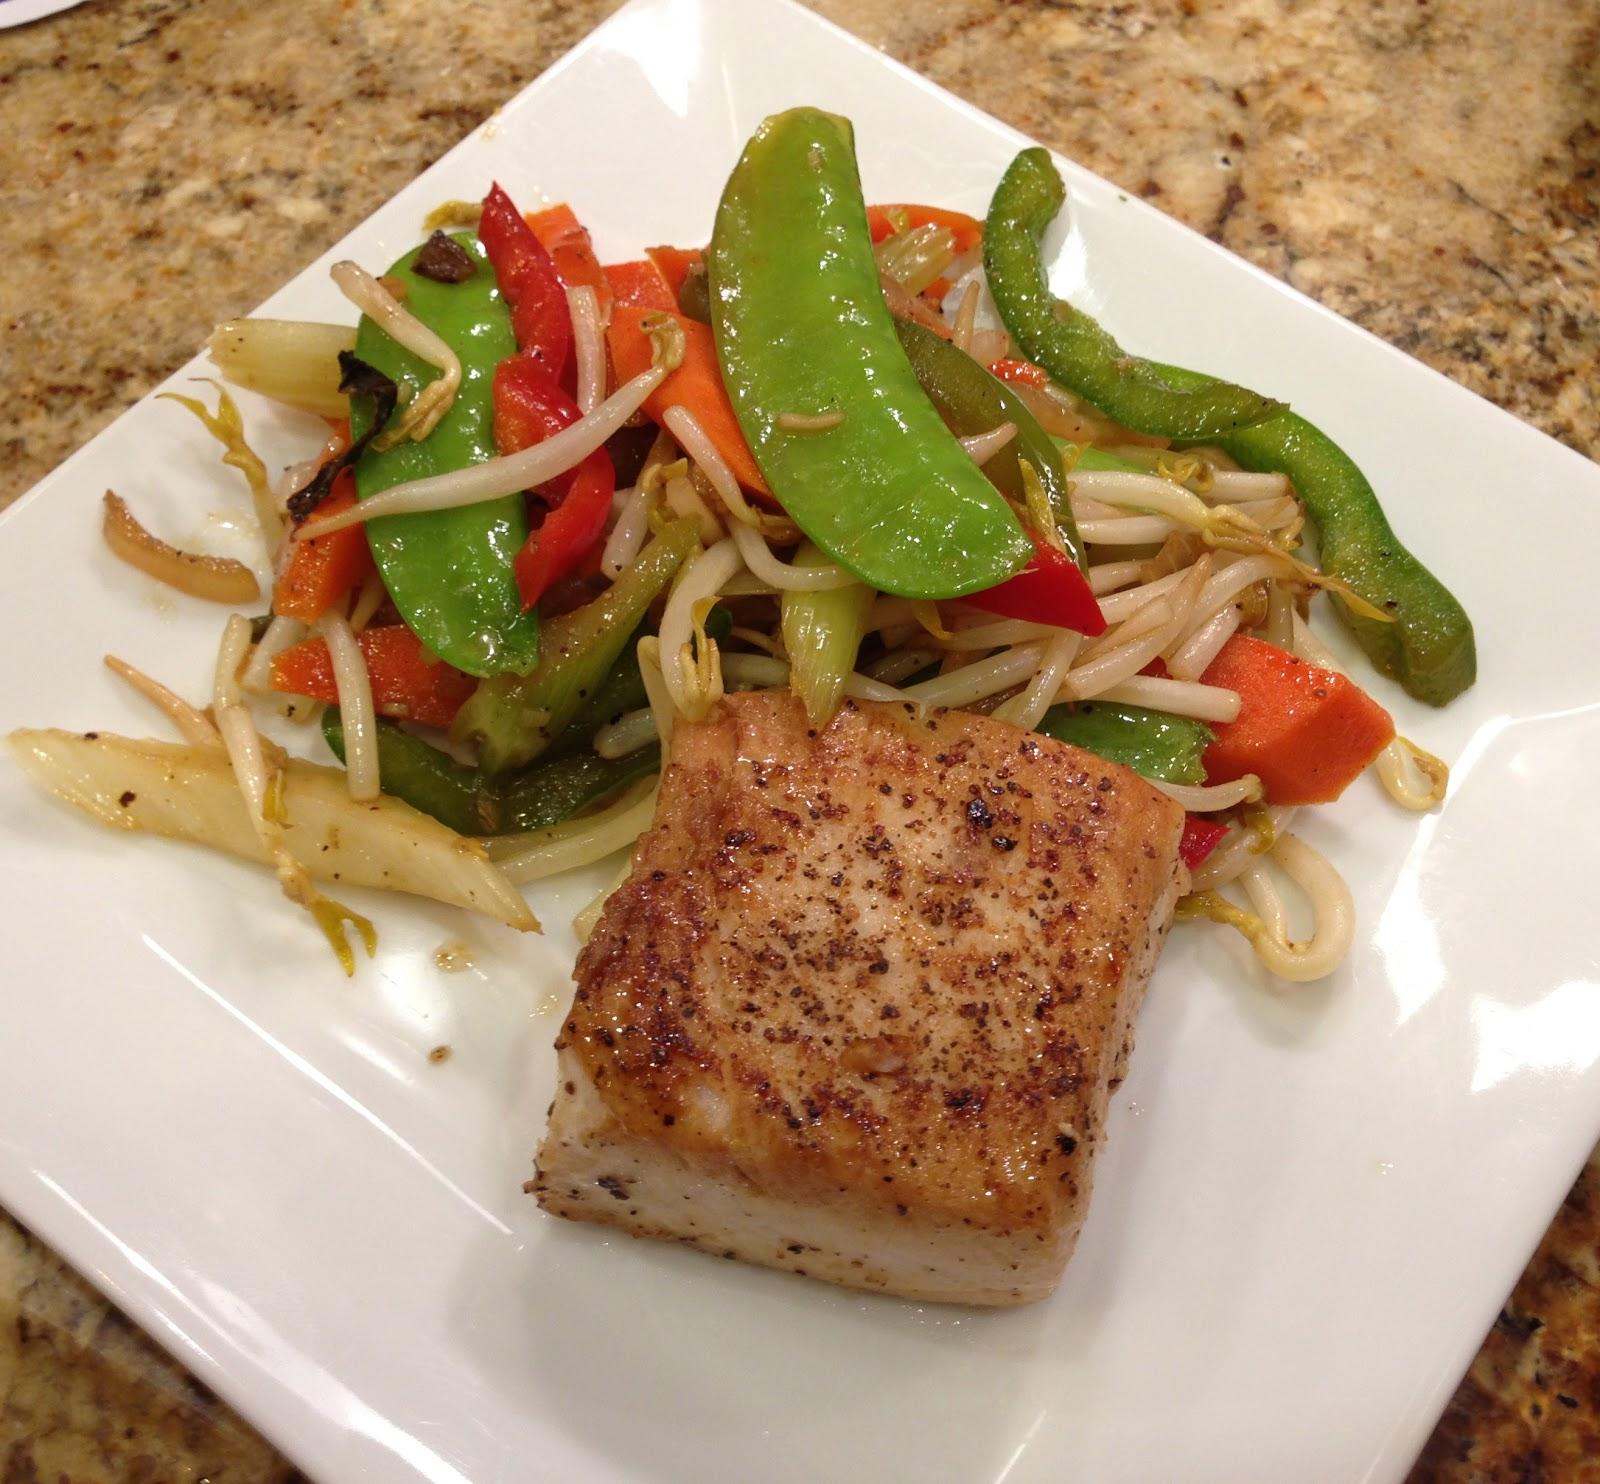 Taste of hawaii fresh island opah and mahi mahi dinner for Opah fish recipes